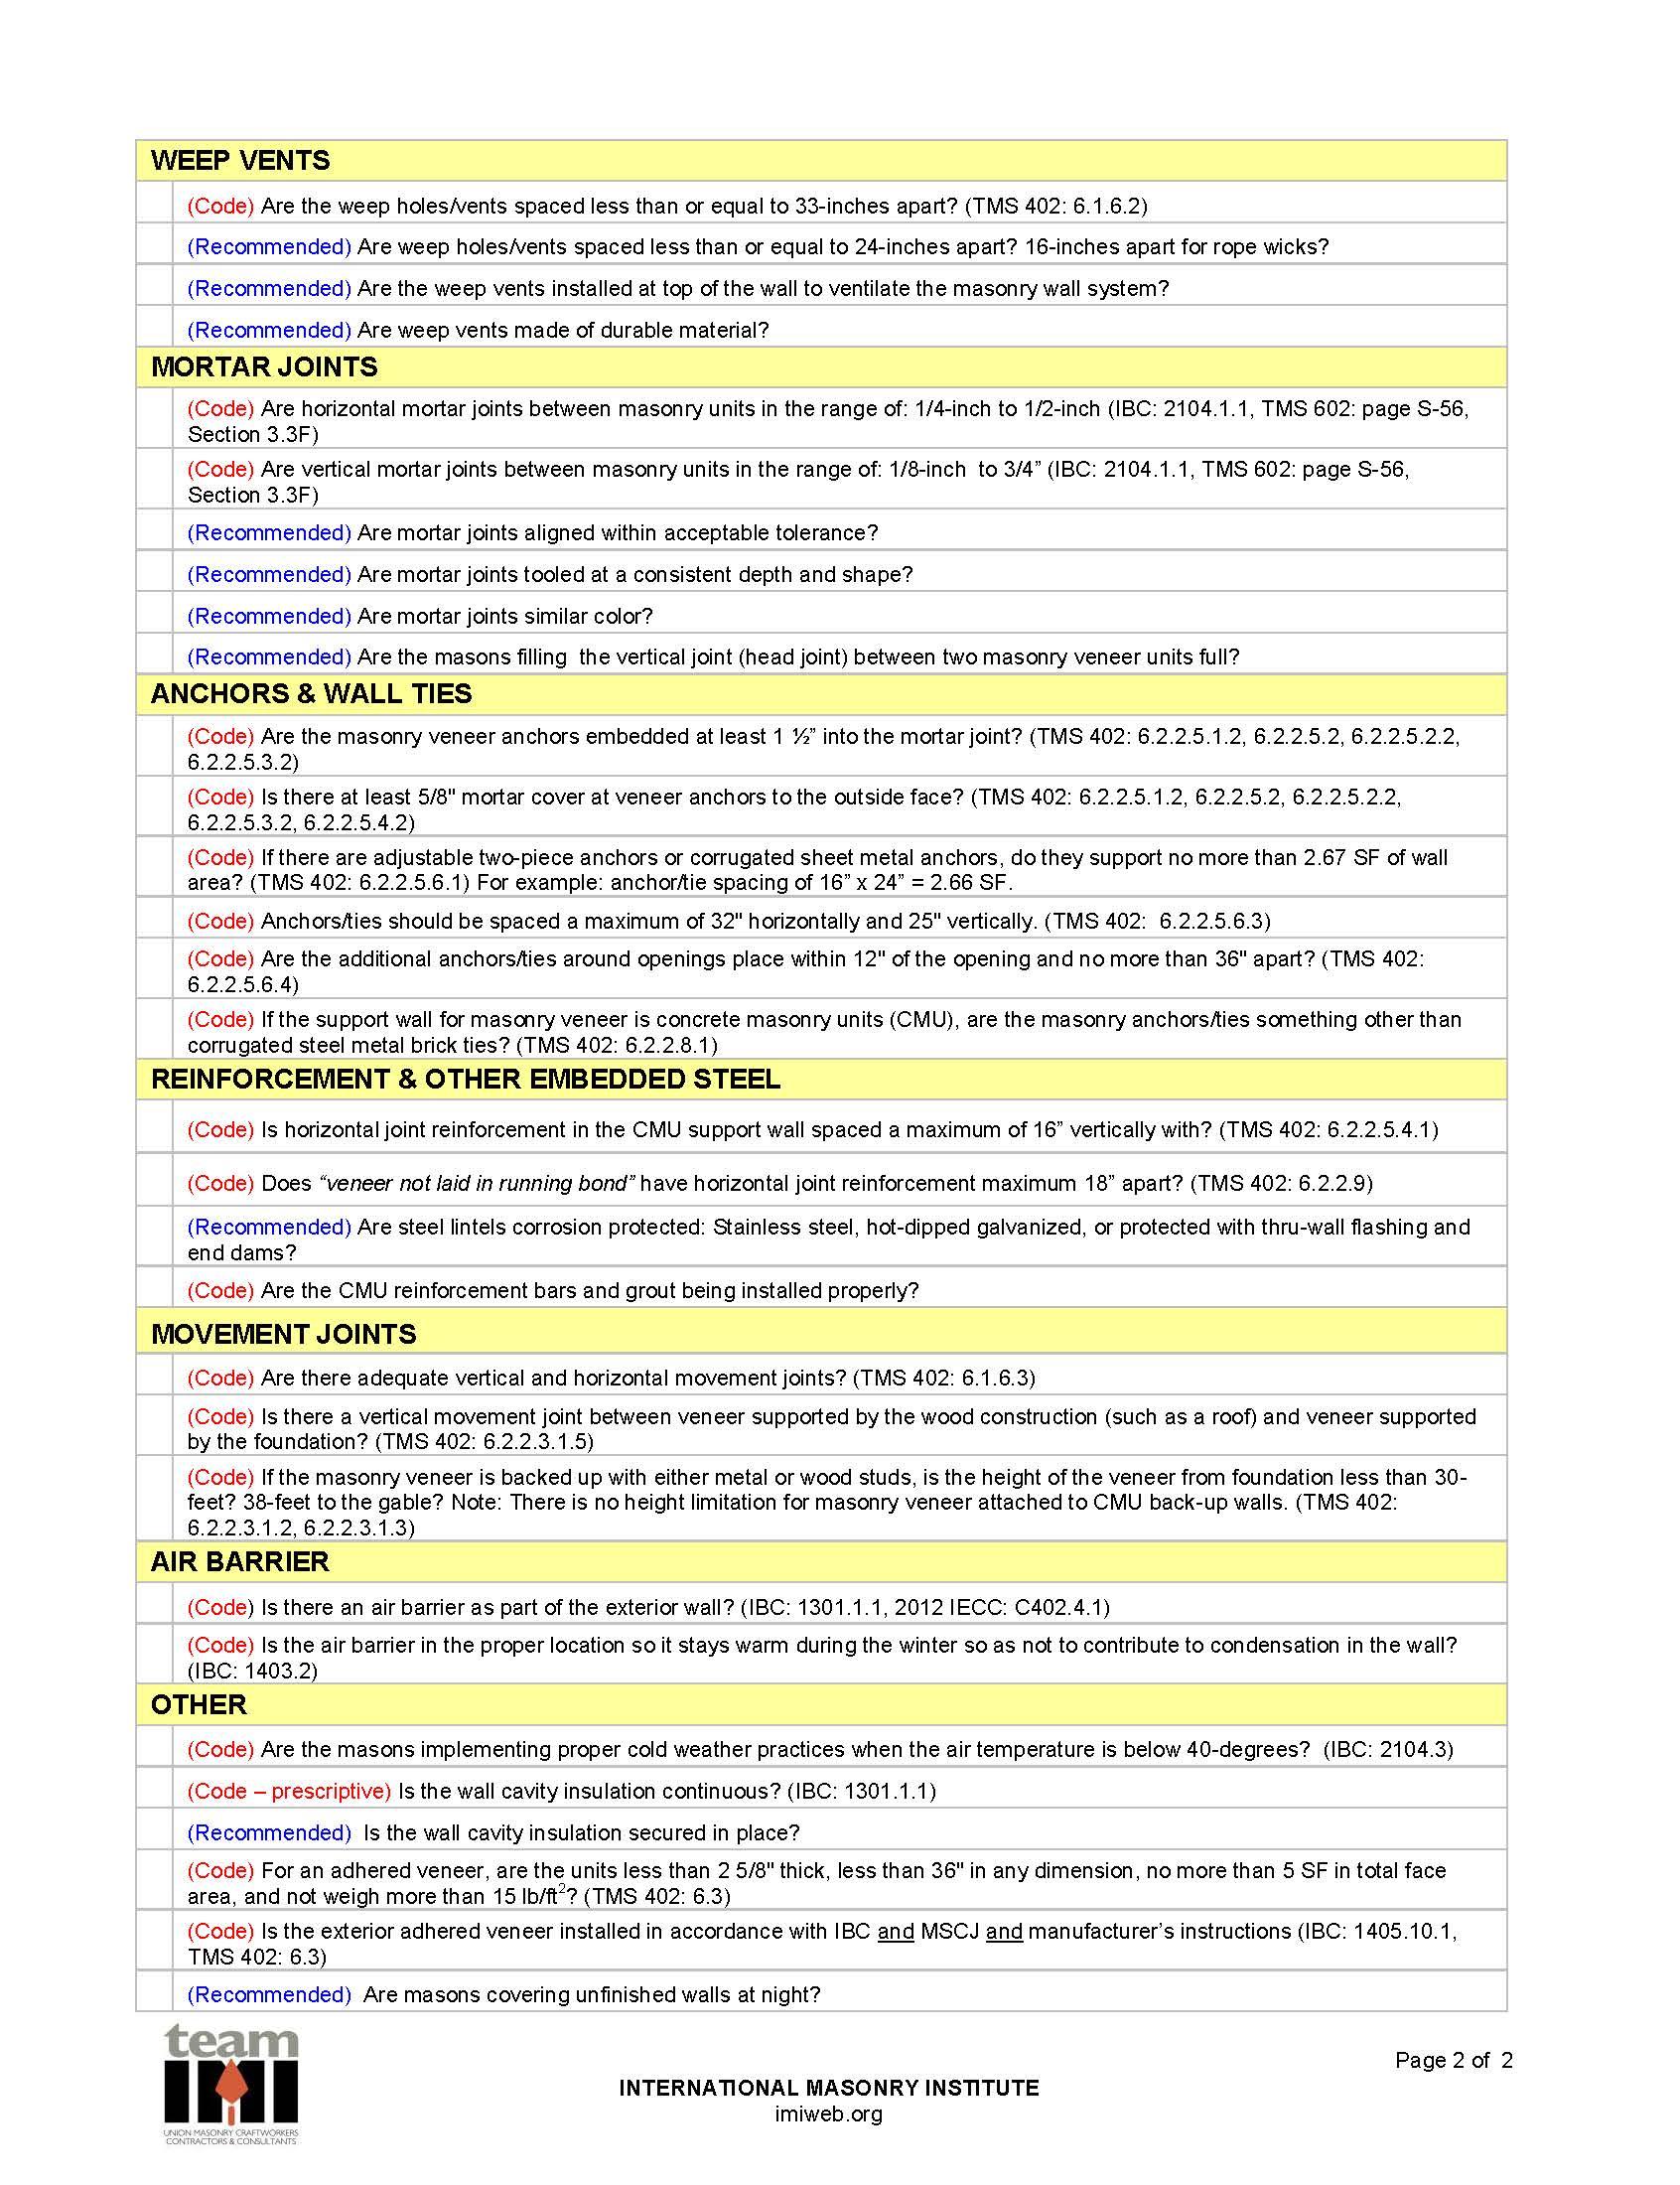 IMI Masonry Inspection Checklist_Page_2.jpg